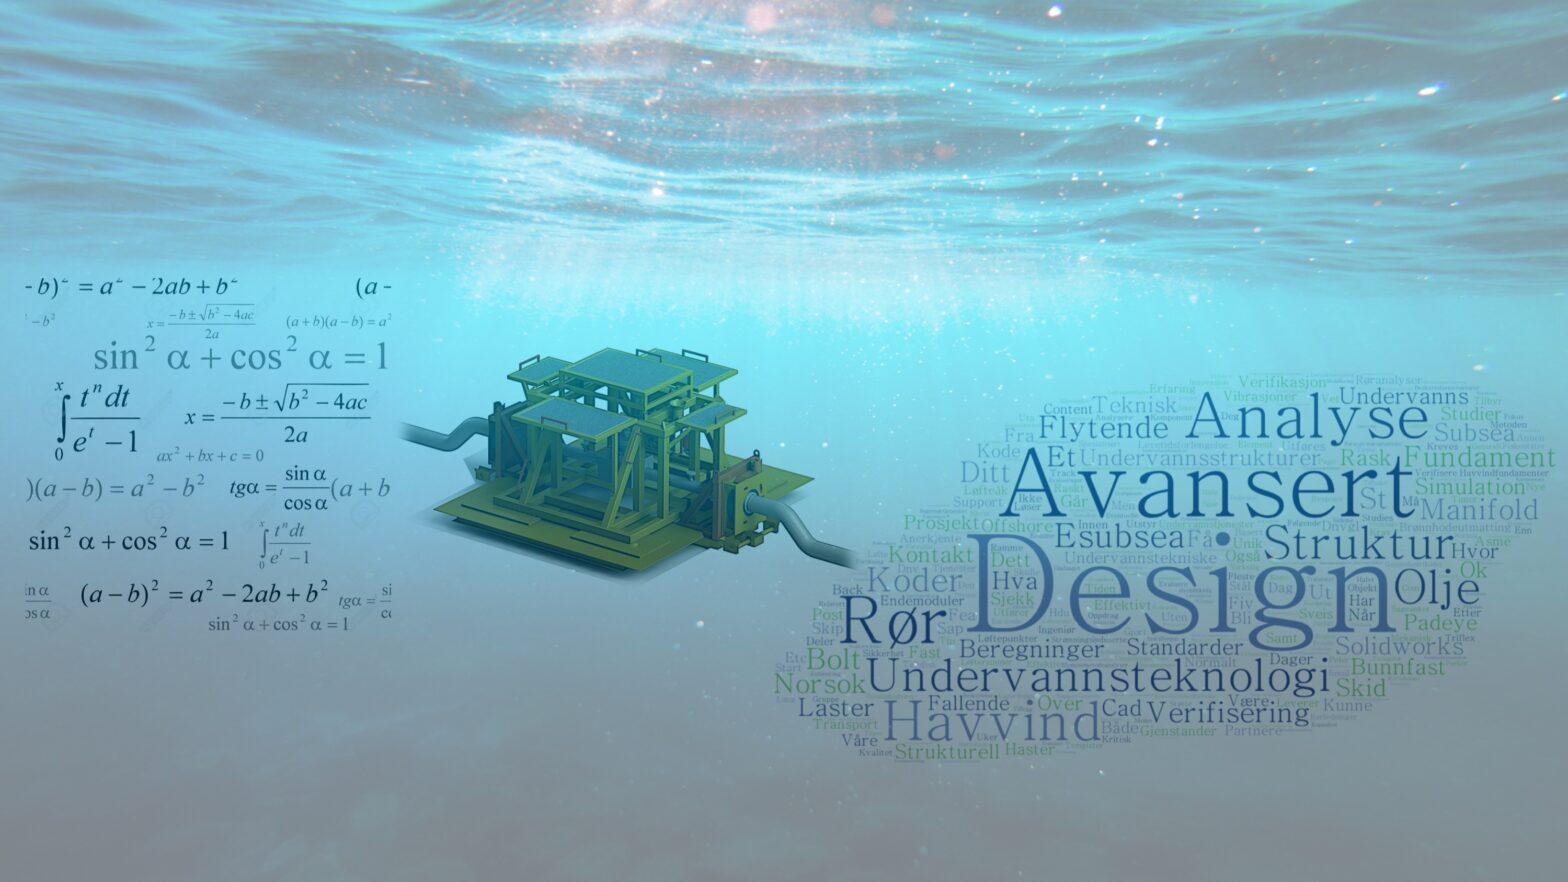 Subsea Koblingssystemer